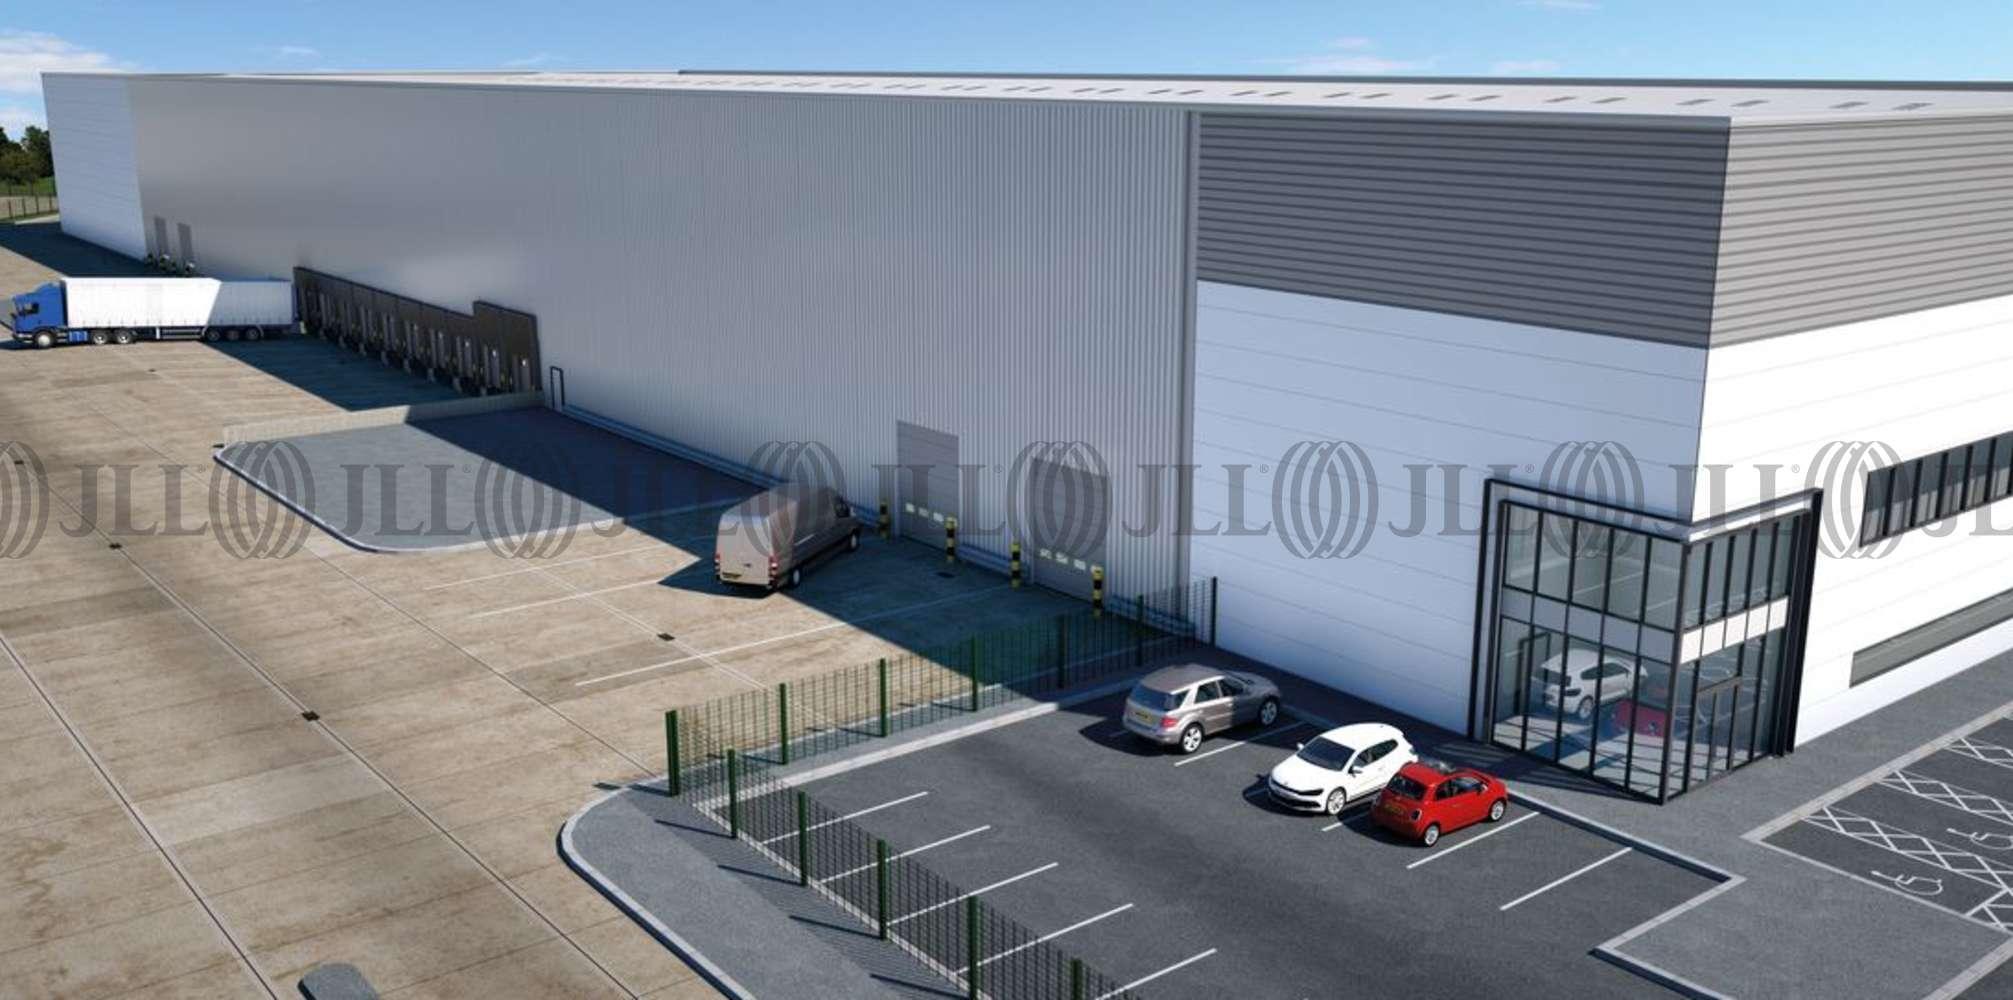 Industrial Bolton, BL5 1BT - Multiply at Logistics North - Unit F2/G - 2